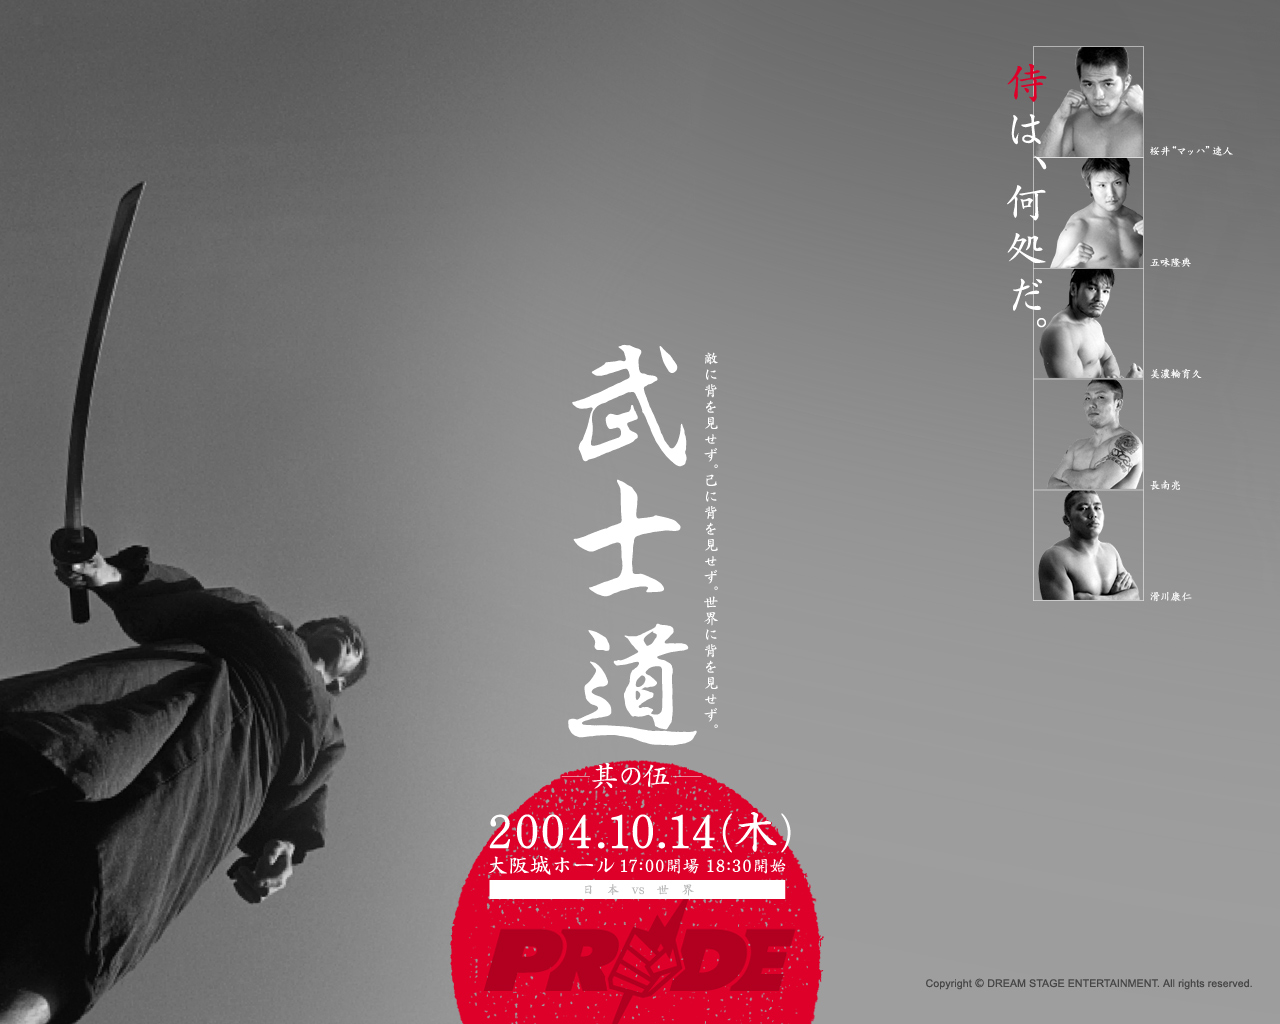 [Image: Pride_Bushido_5_event_poster.jpg]